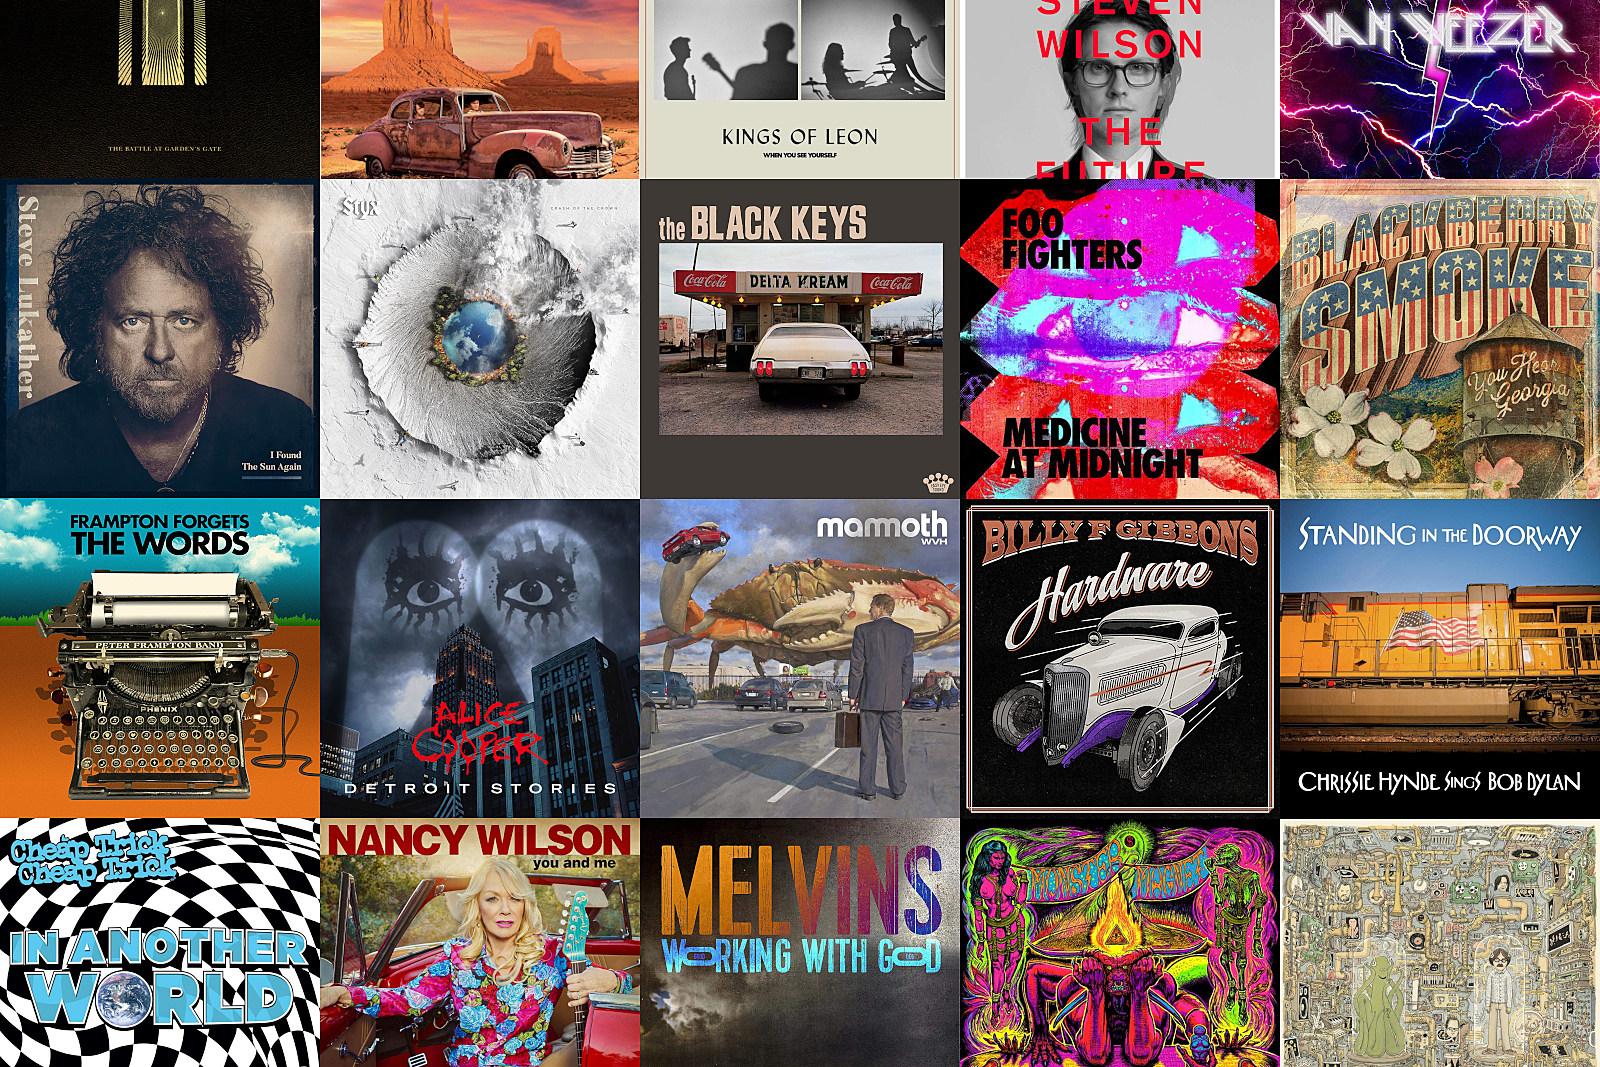 20 Best Rock Albums of 2021 (So Far)